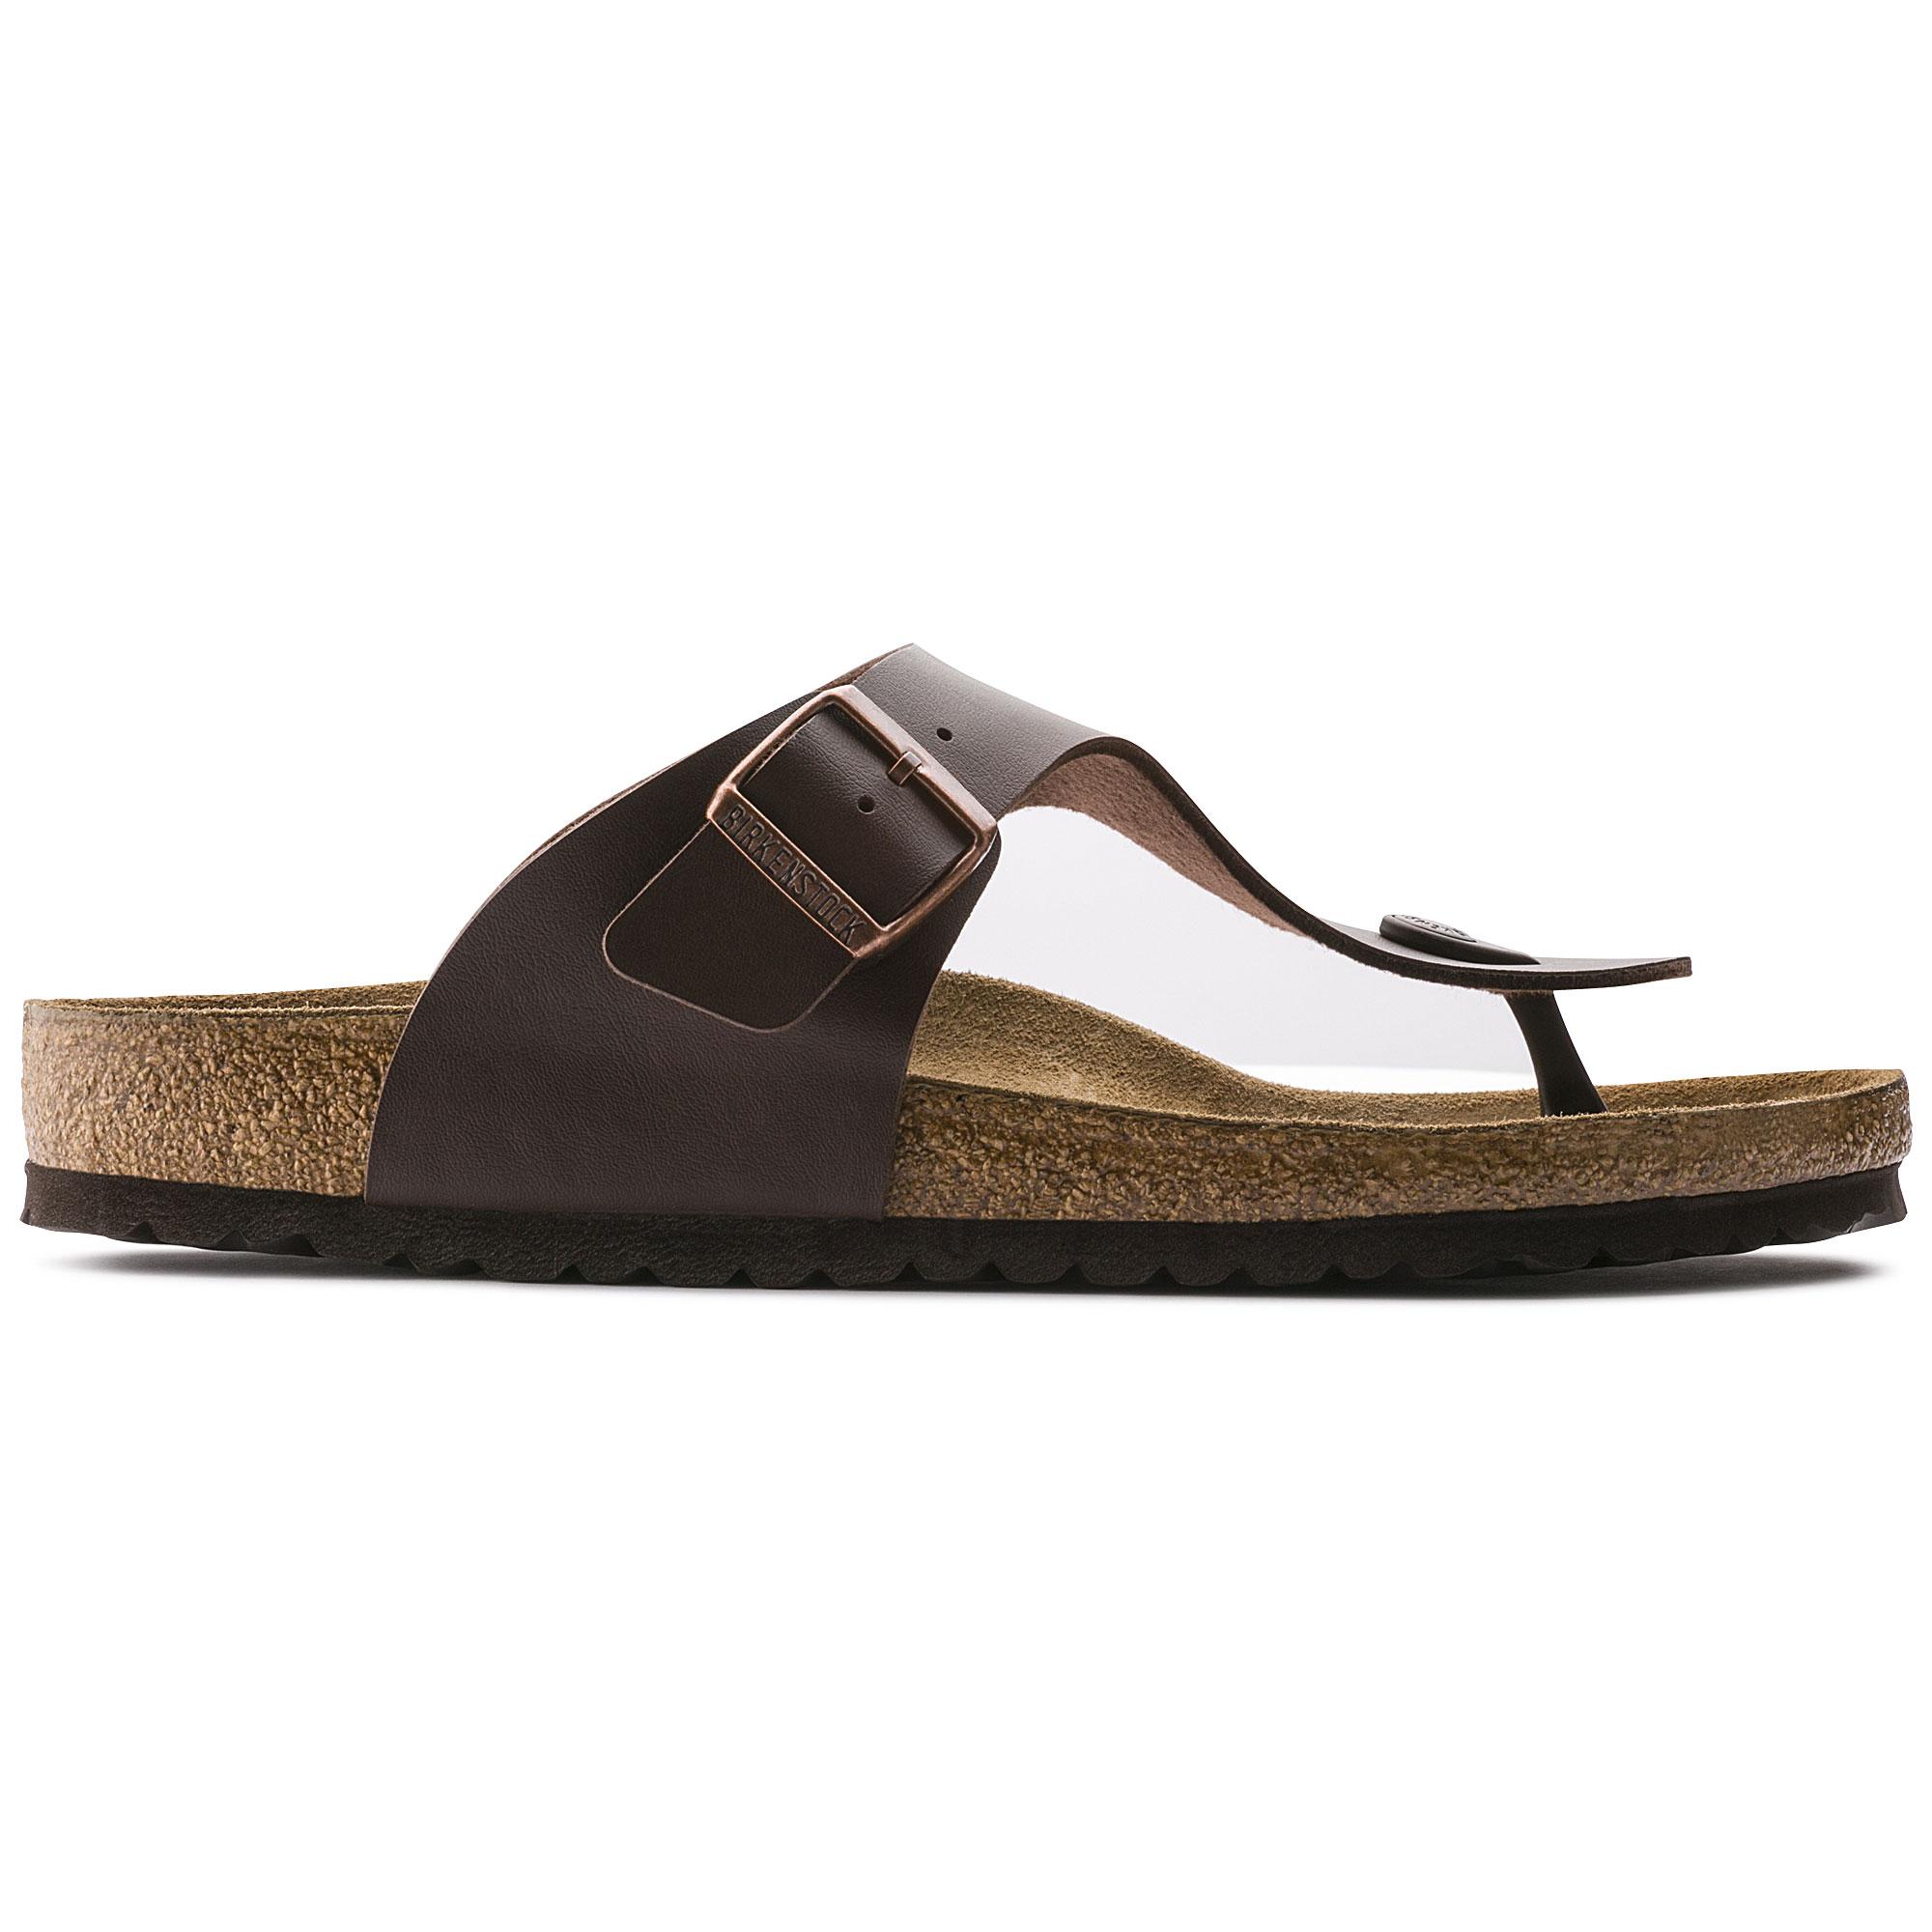 Birkenstock Unisex Mayari Birko Flor Black Sandals 5 UK